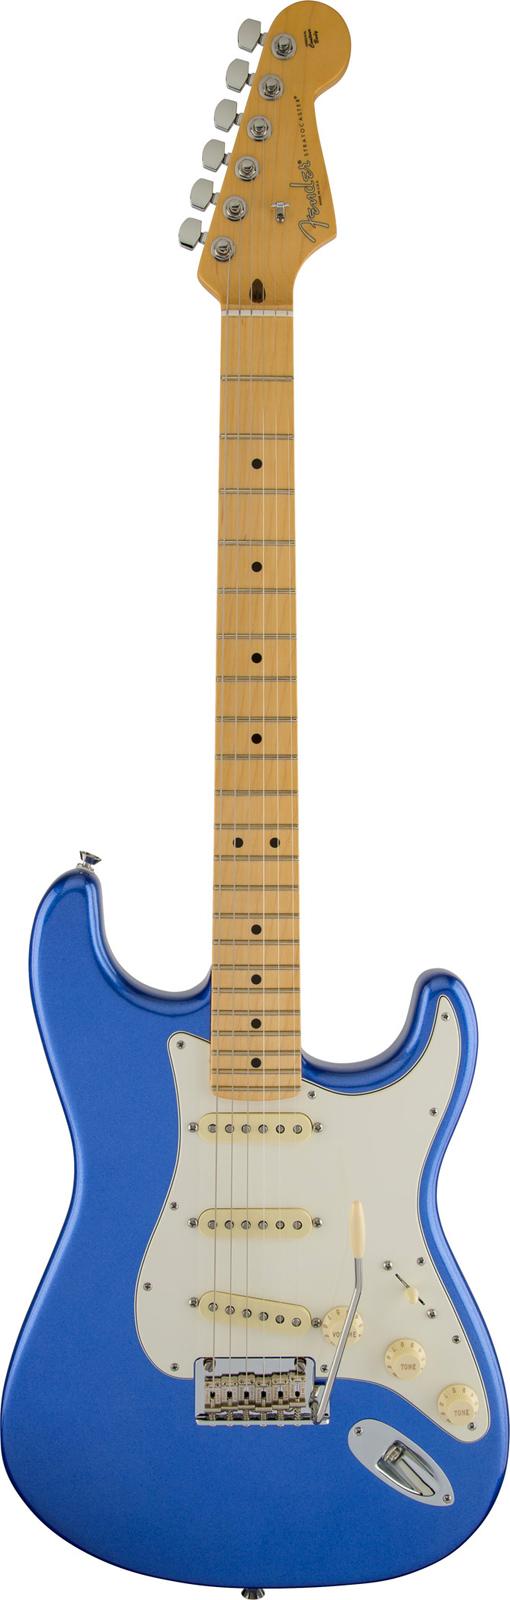 Fender American Standard Stratocaster Ocean Blue Metallic + Etui